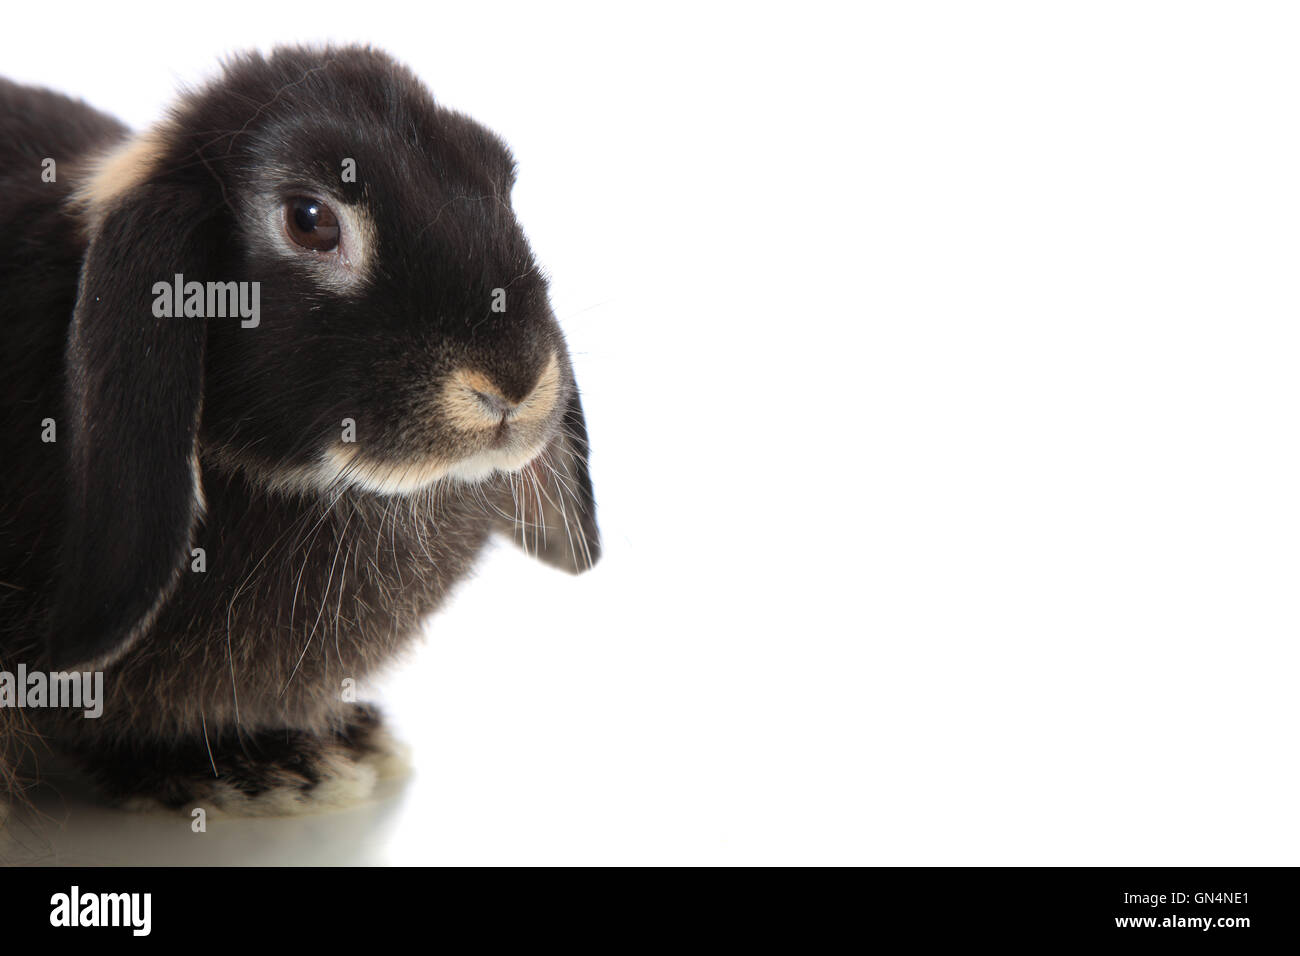 Black rabbit - Stock Image